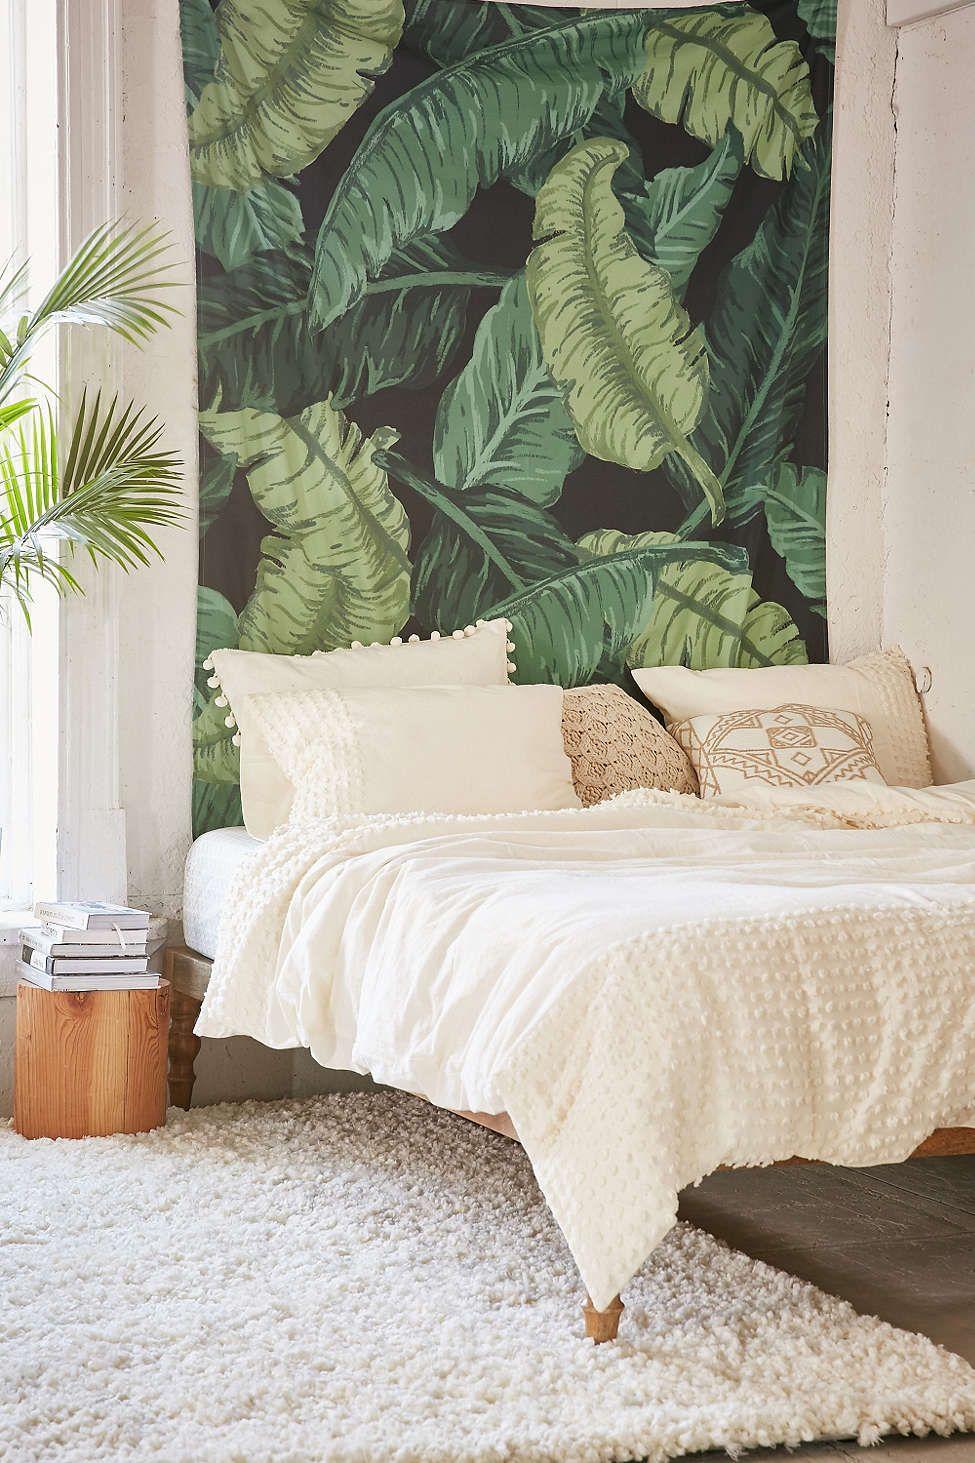 20 Refreshing Modern Bedroom Design Ideas Con Imagenes